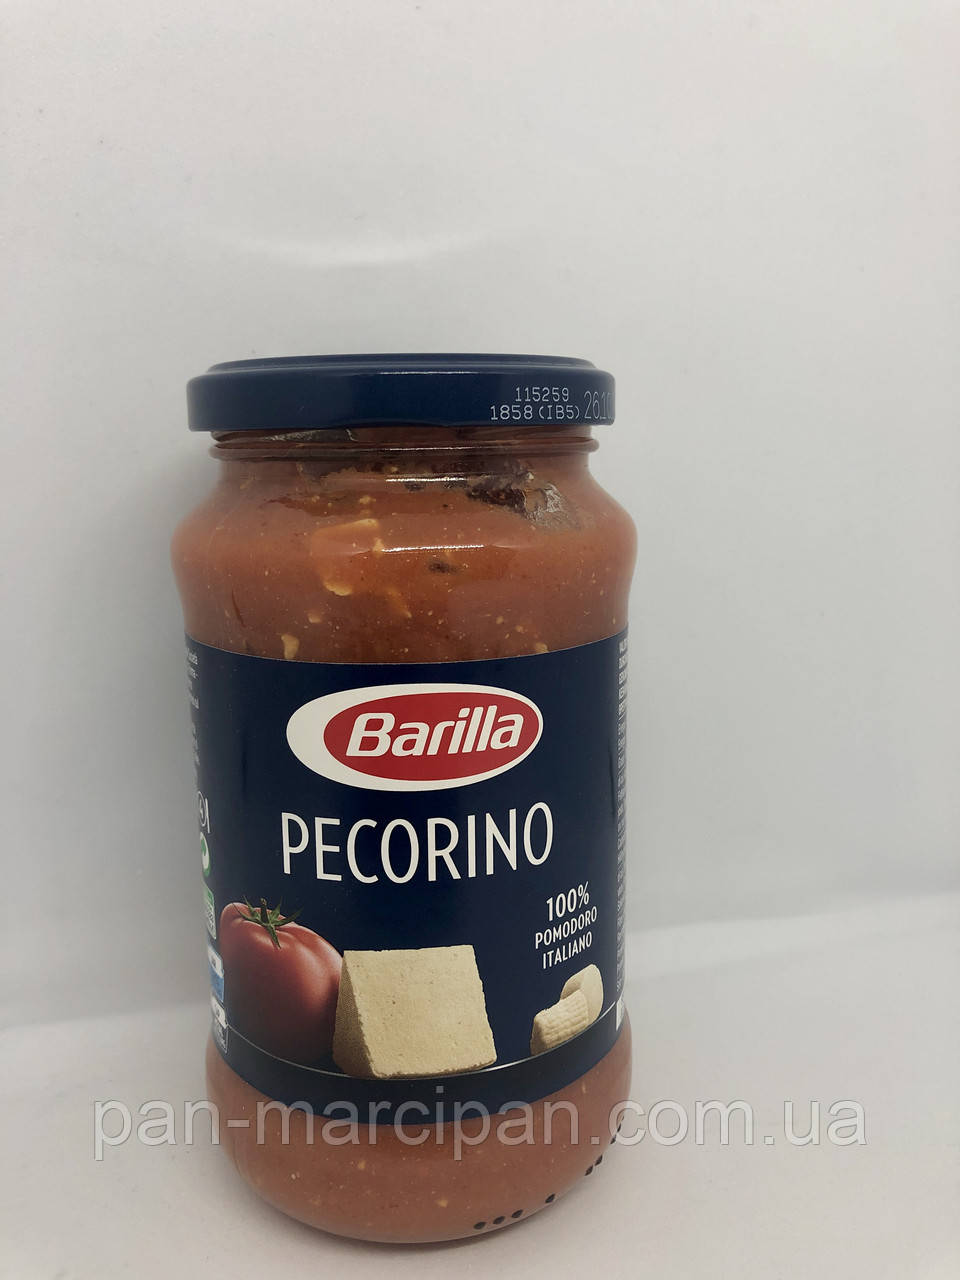 Соус Barilla Pecorino 400г Італія